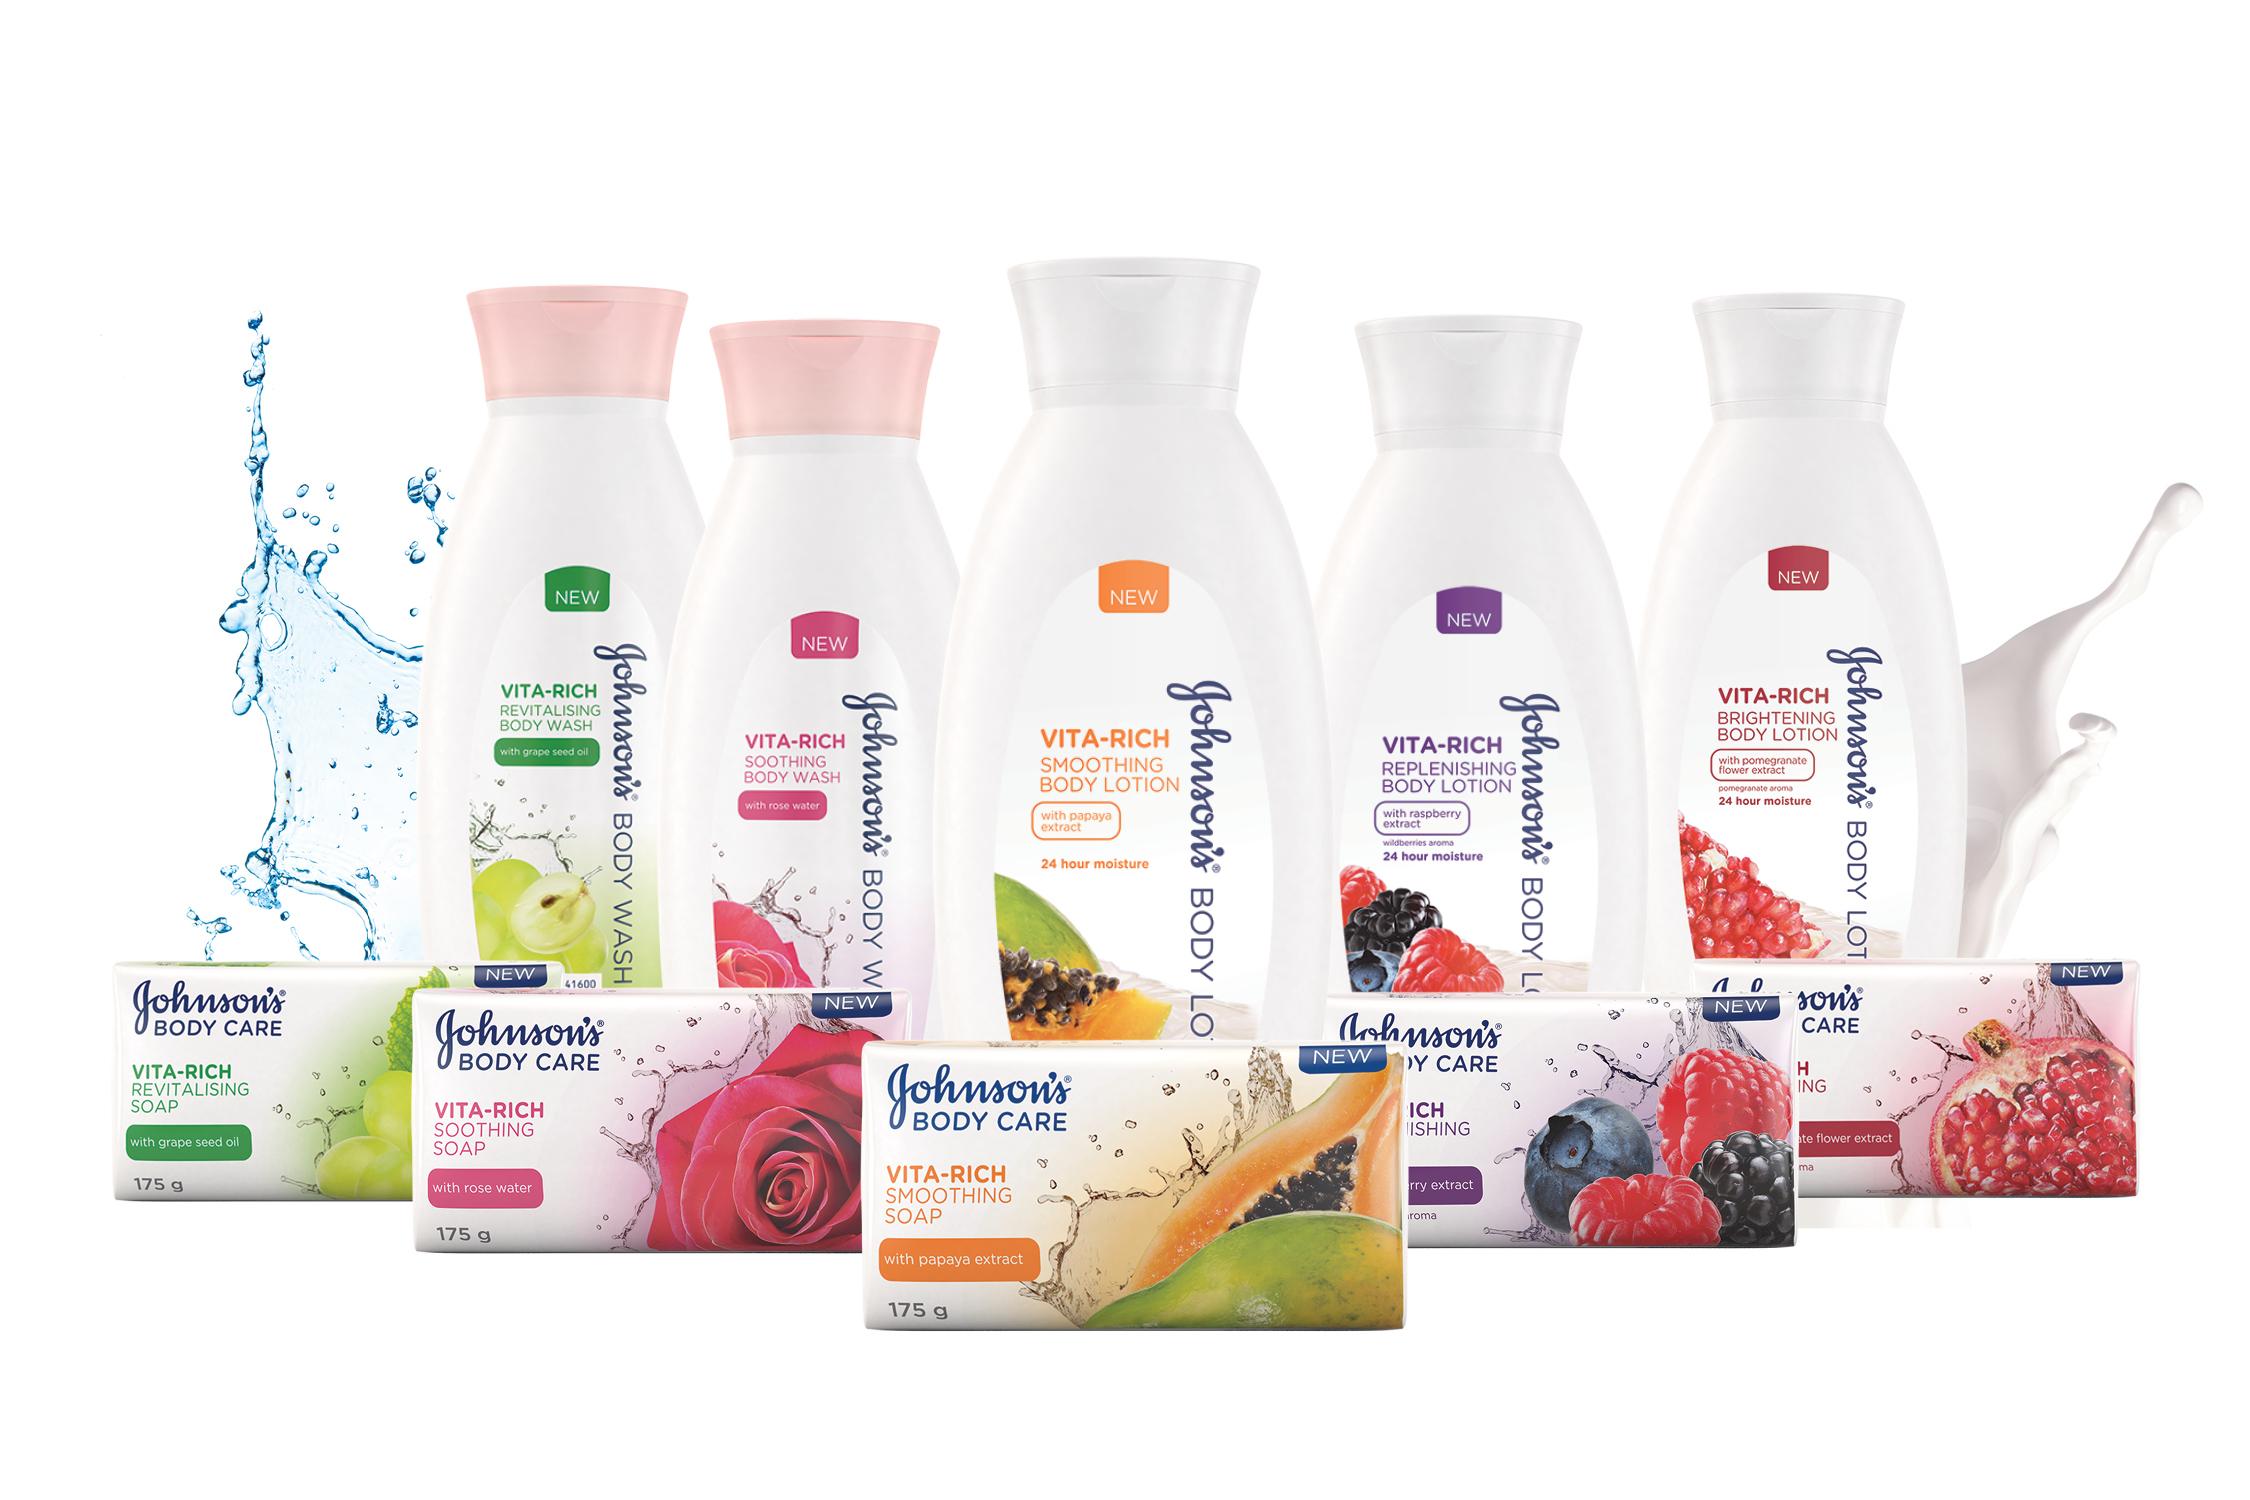 Johnson's body care product range